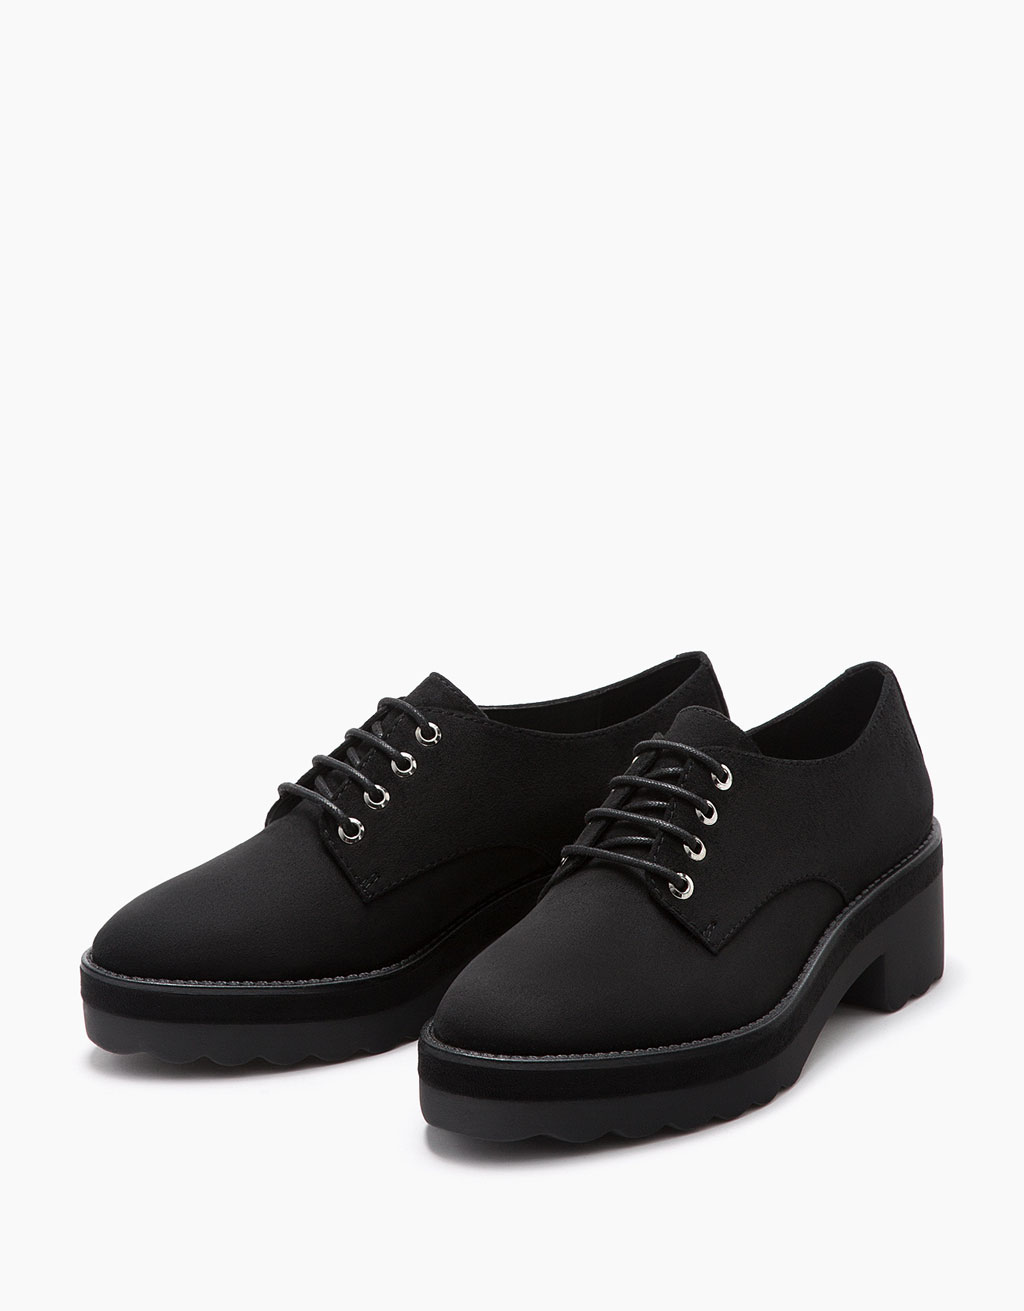 chaussures bershka france. Black Bedroom Furniture Sets. Home Design Ideas